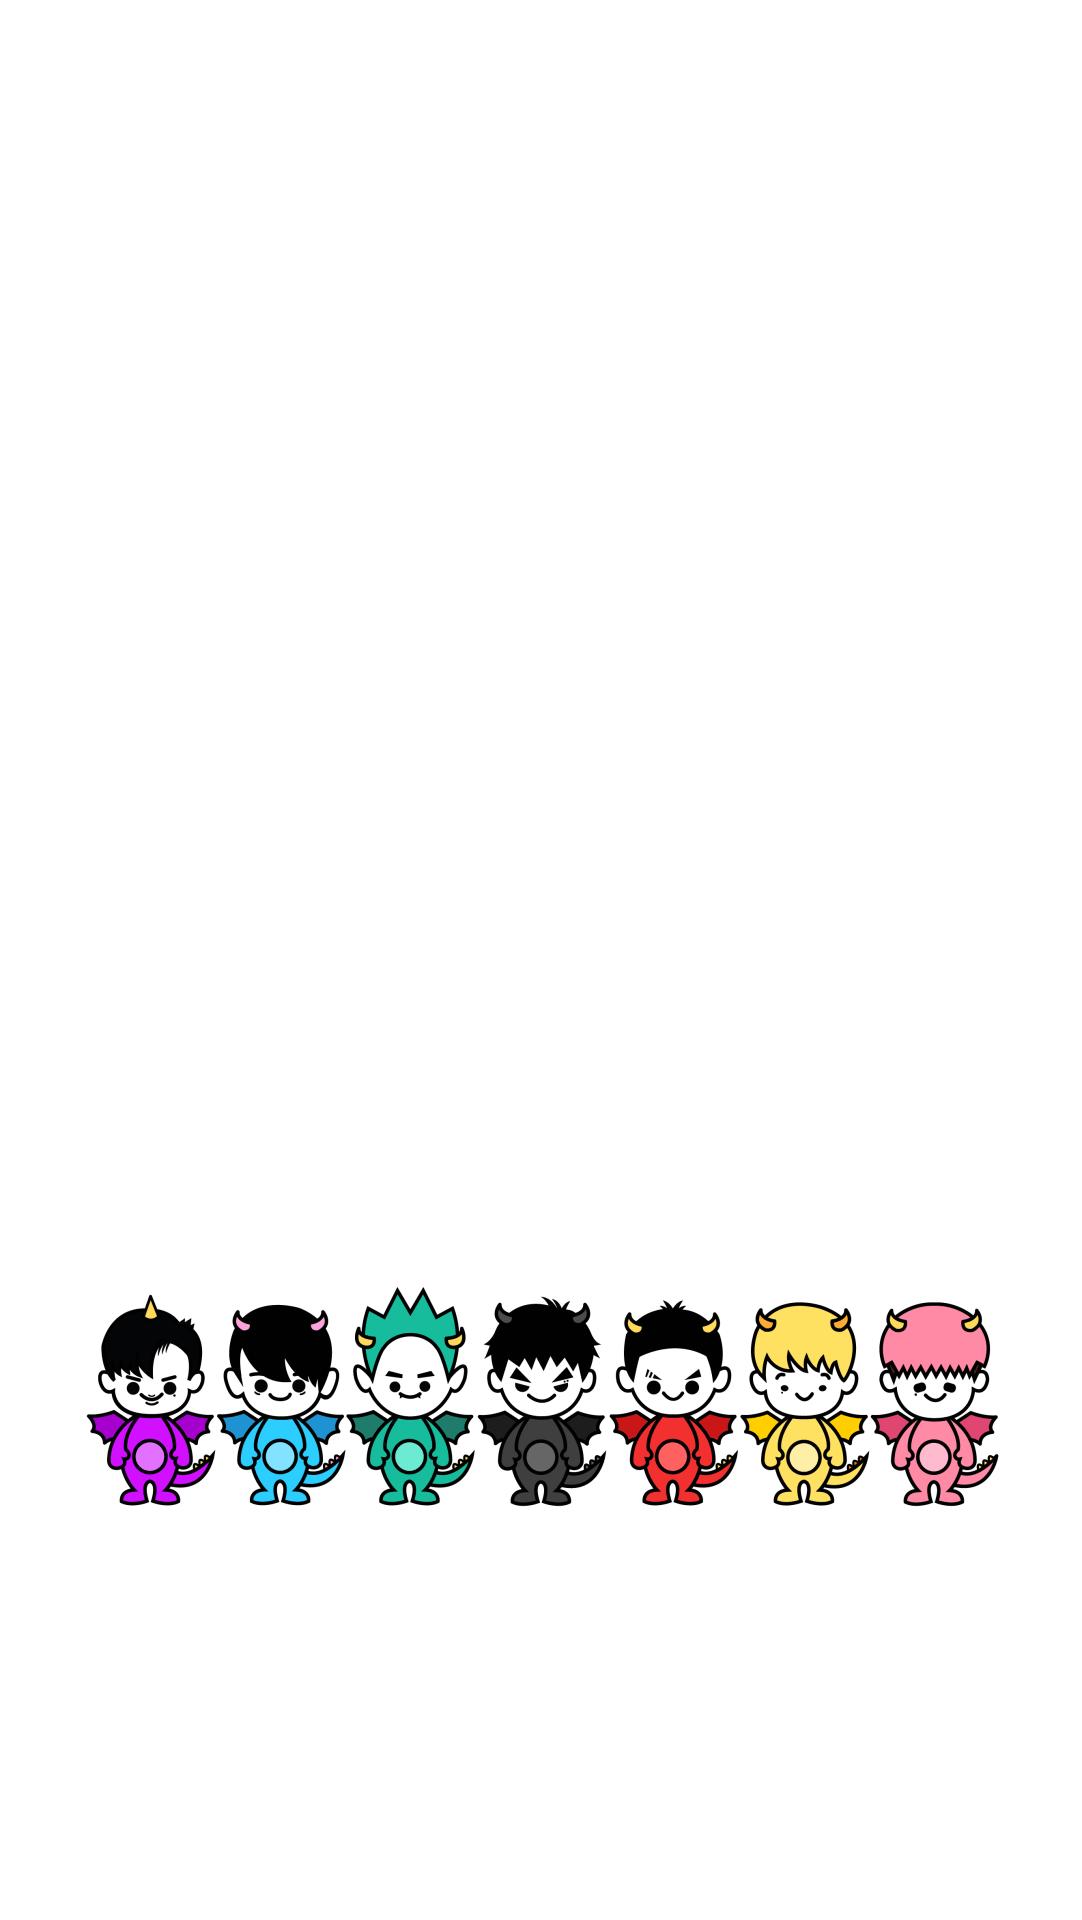 Cute Pink Owl Wallpaper For Iphone Phone Wallpapers Tumblr Hd Pixelstalk Net